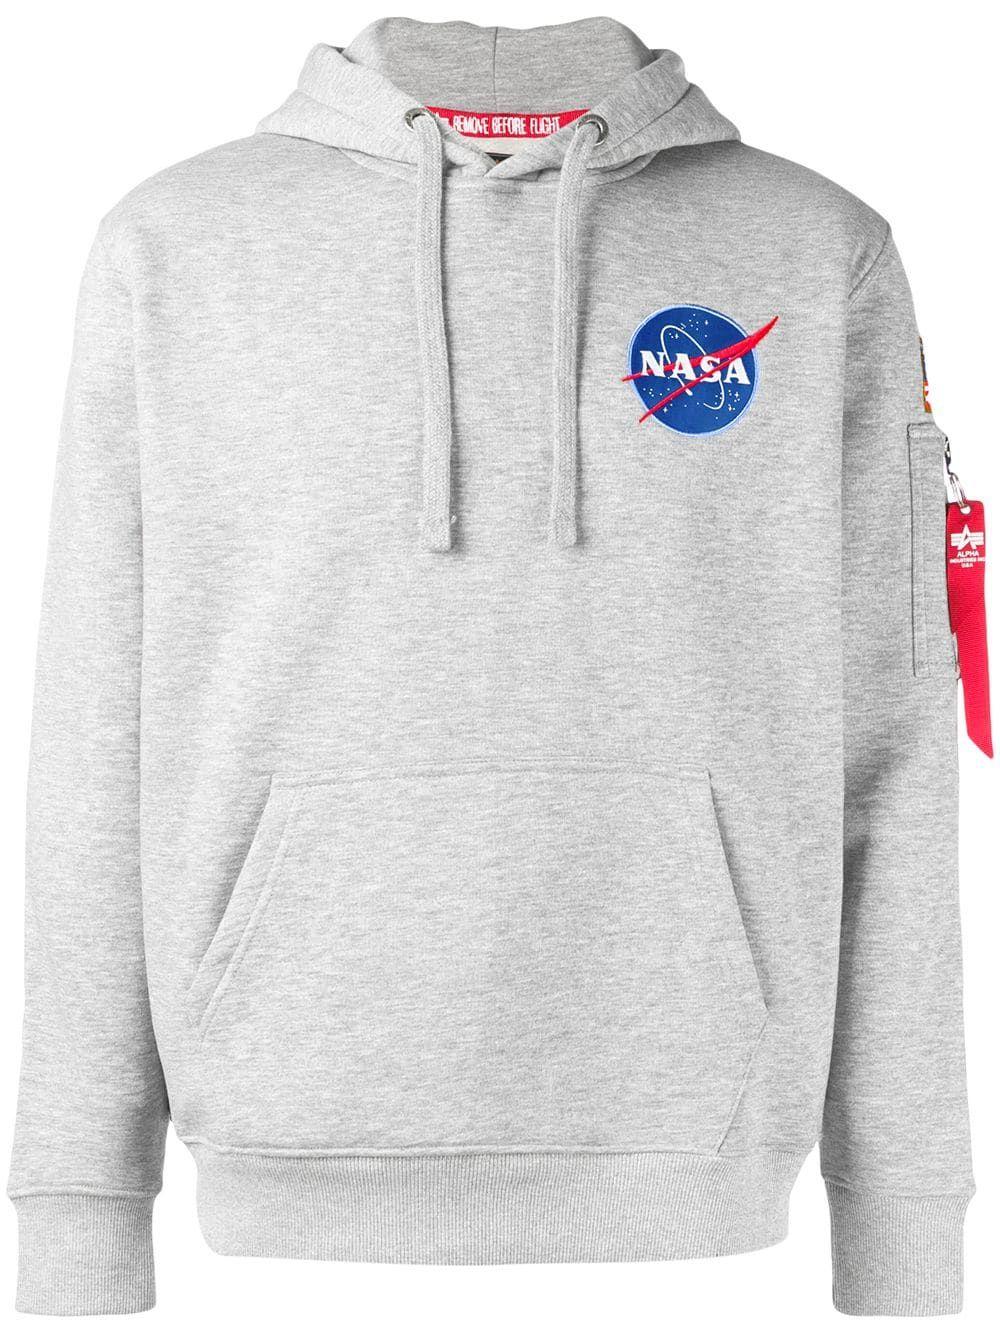 Damen Sport Kaputzenpullis & Sweatshirts aus Fleece günstig